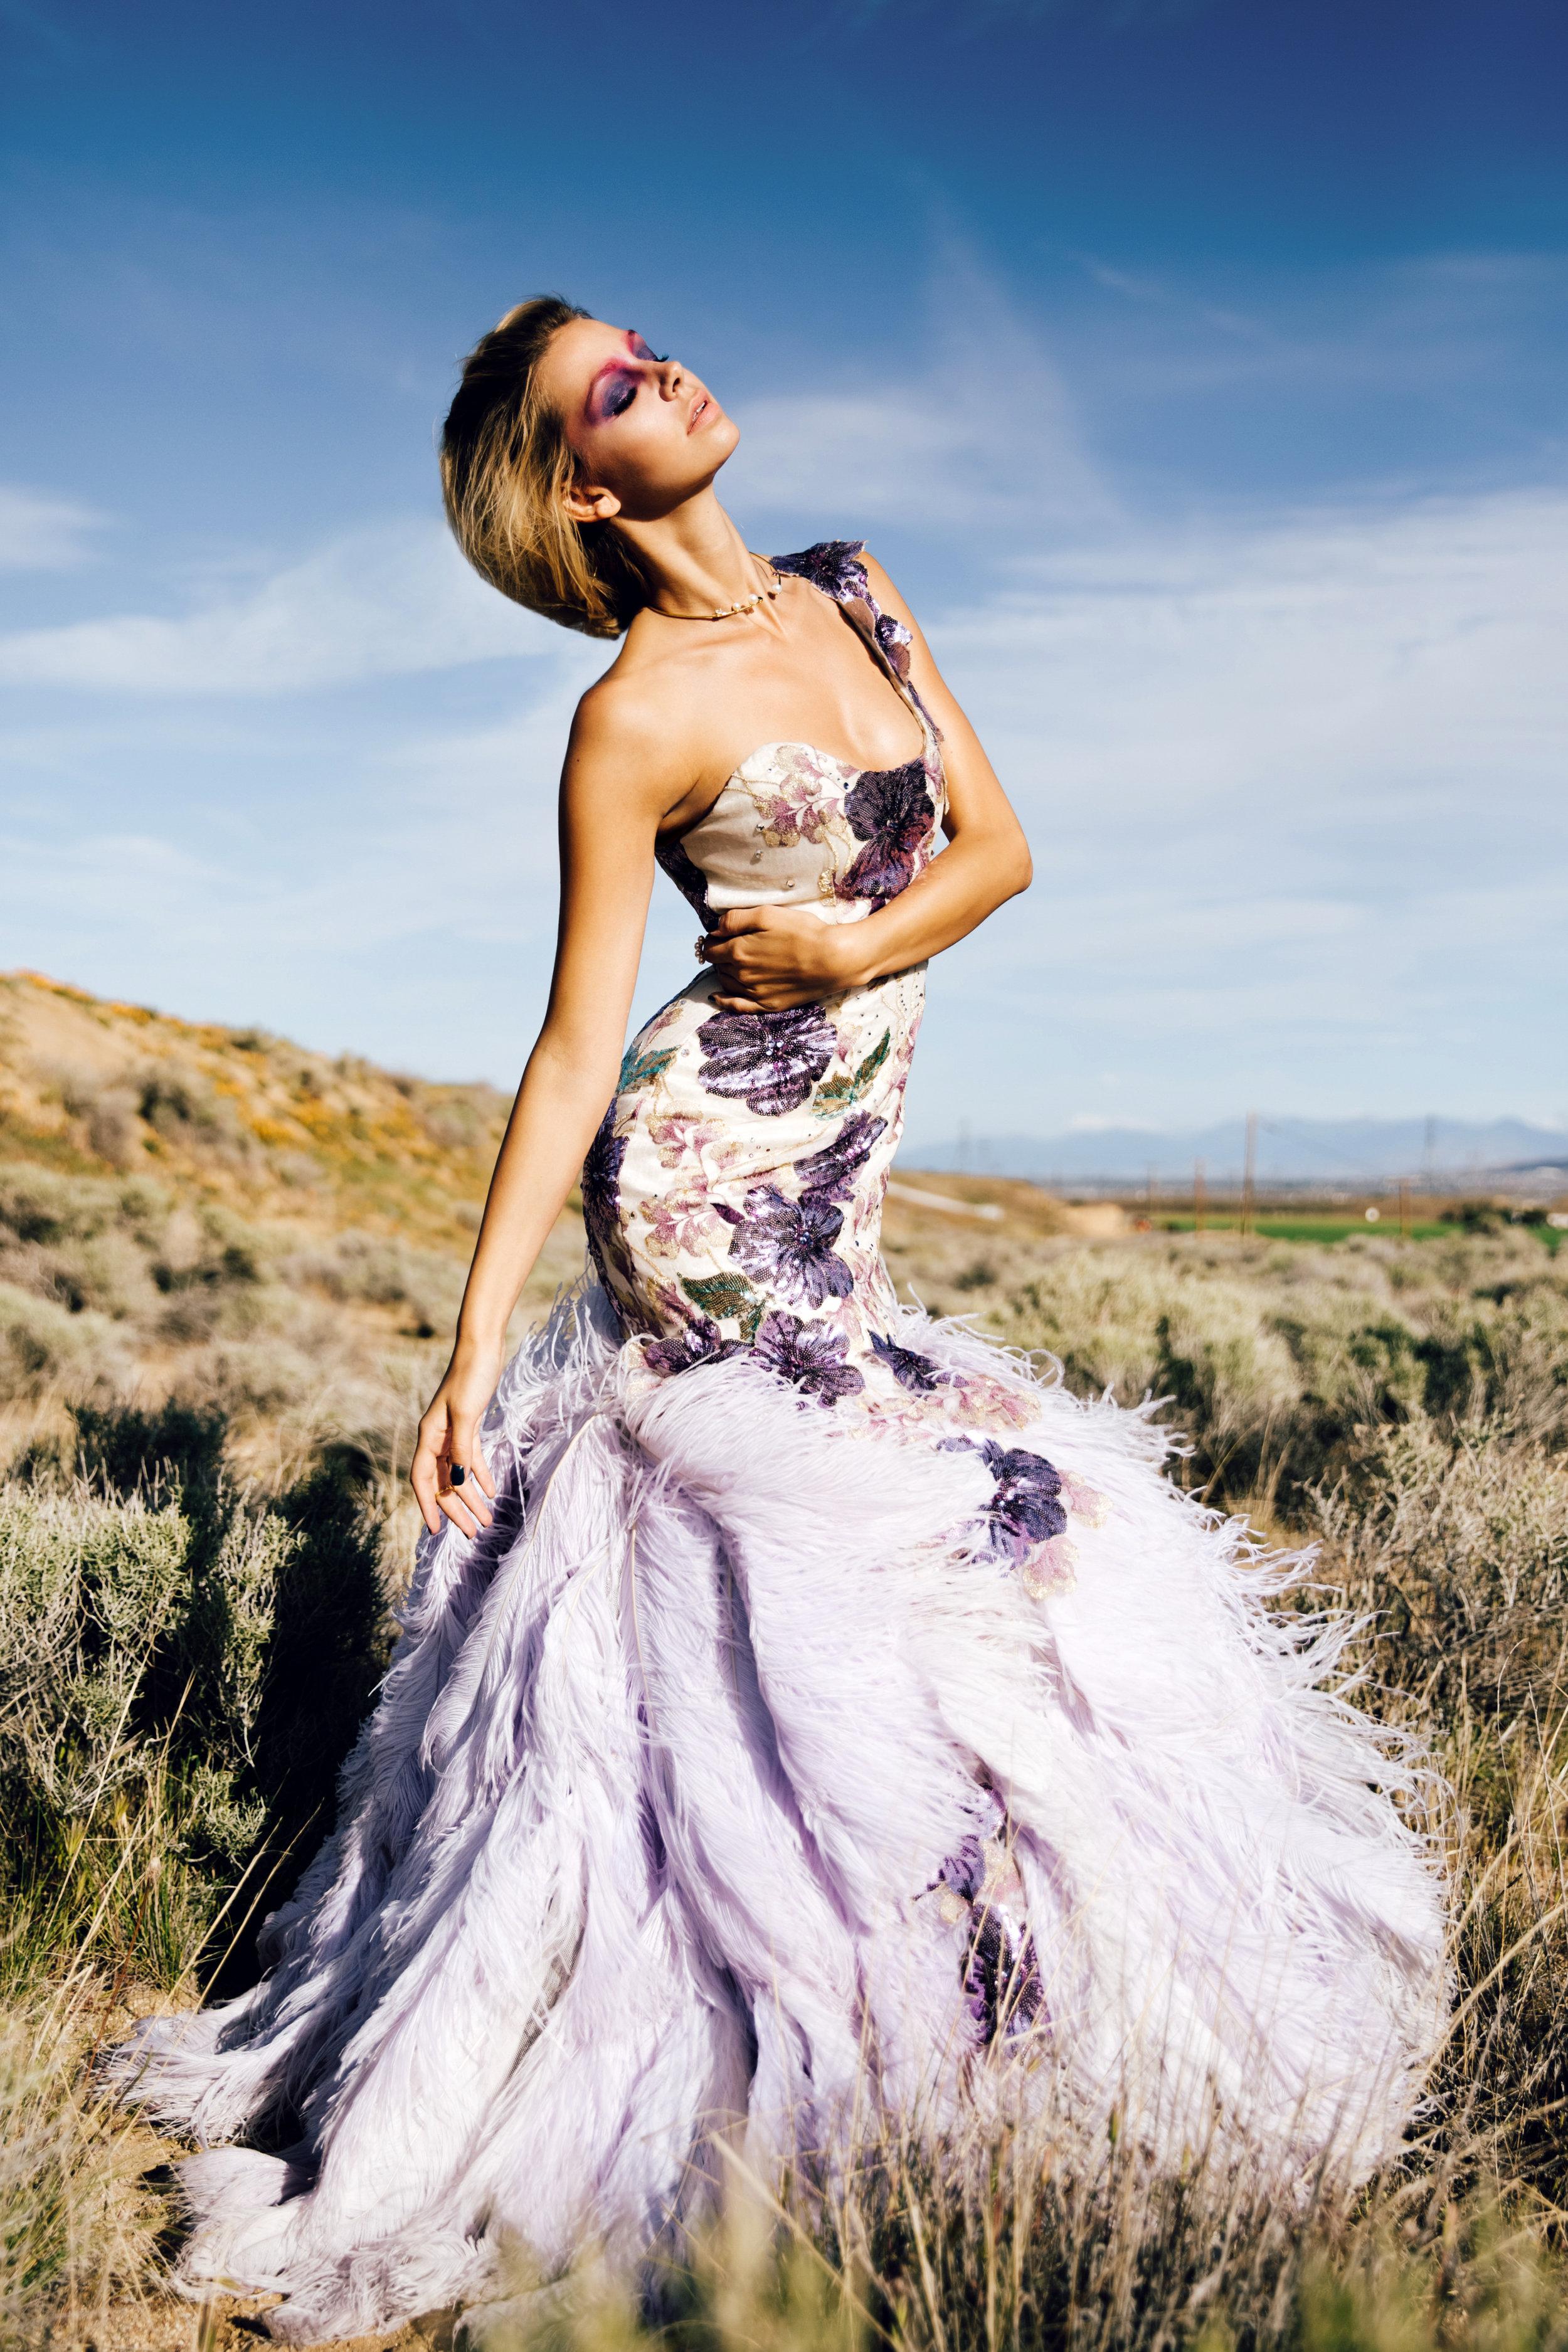 Dress: Joey Galon / Necklace & Ring: Gold Philosophy